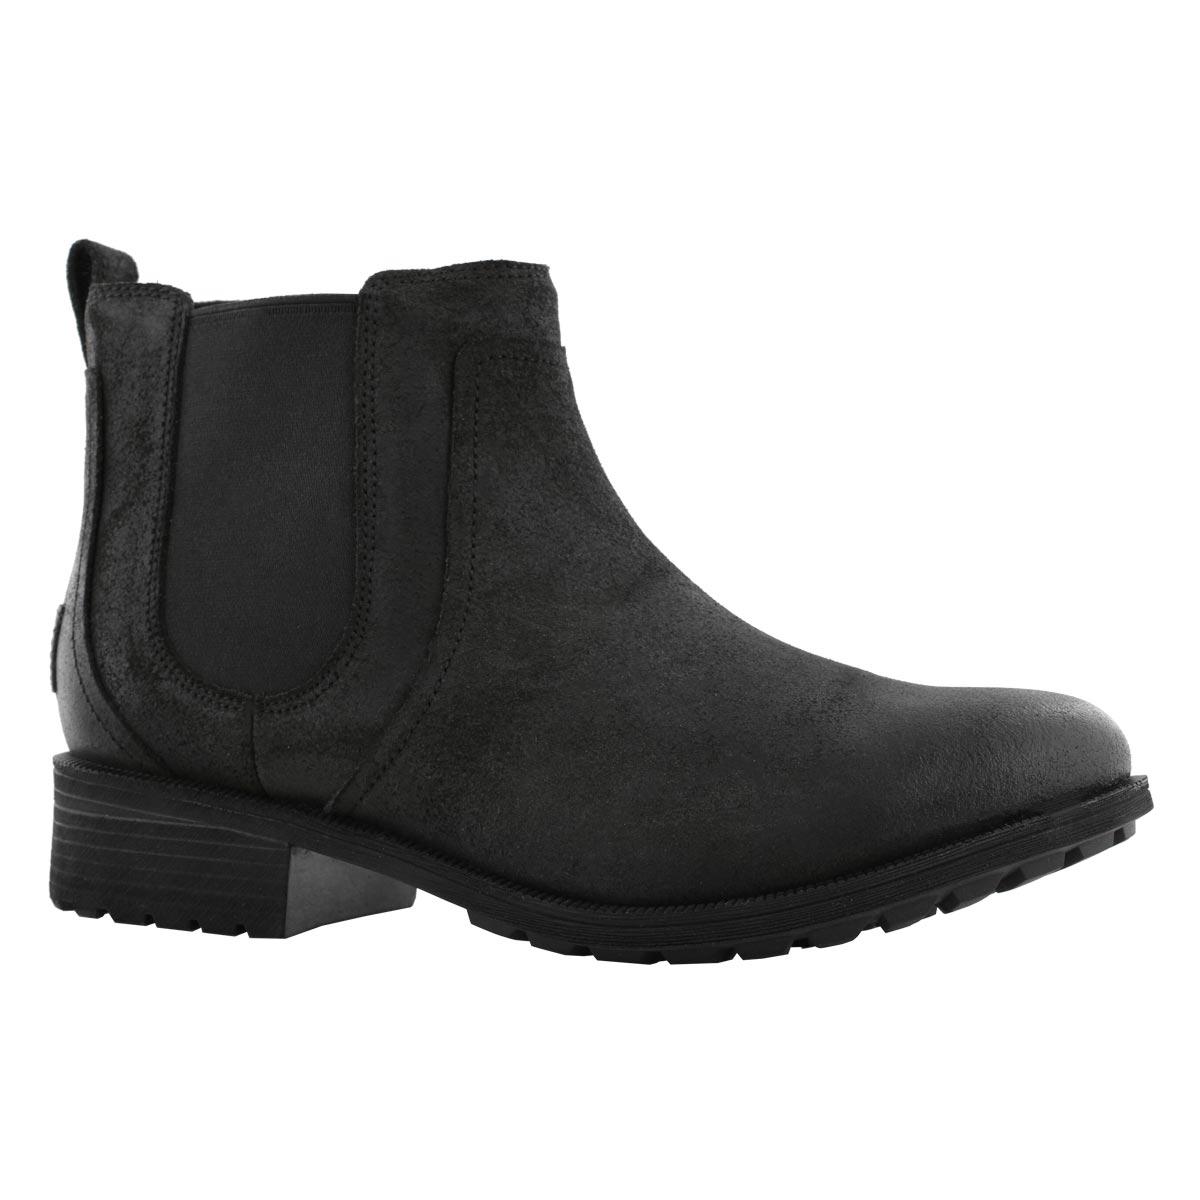 Lds Bonham II black wtpf chelsea boot